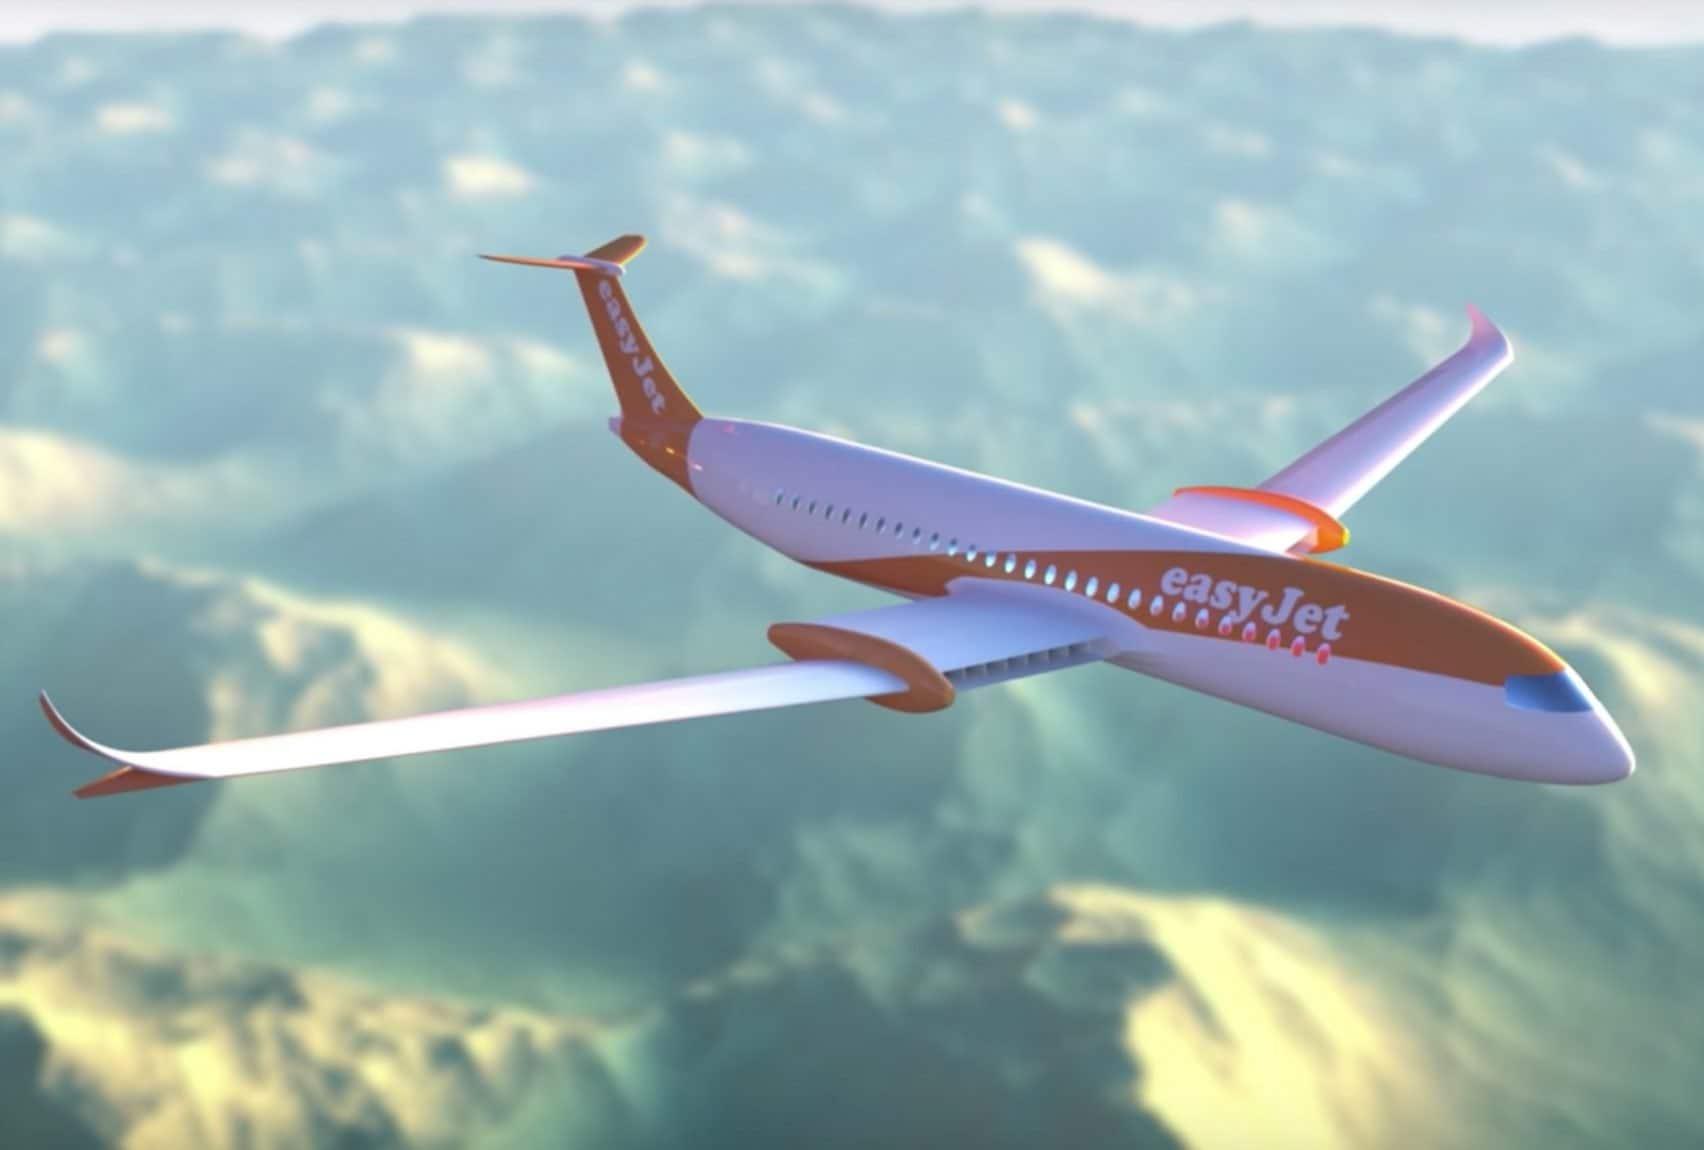 easy-jet-aereo-elettrico-02